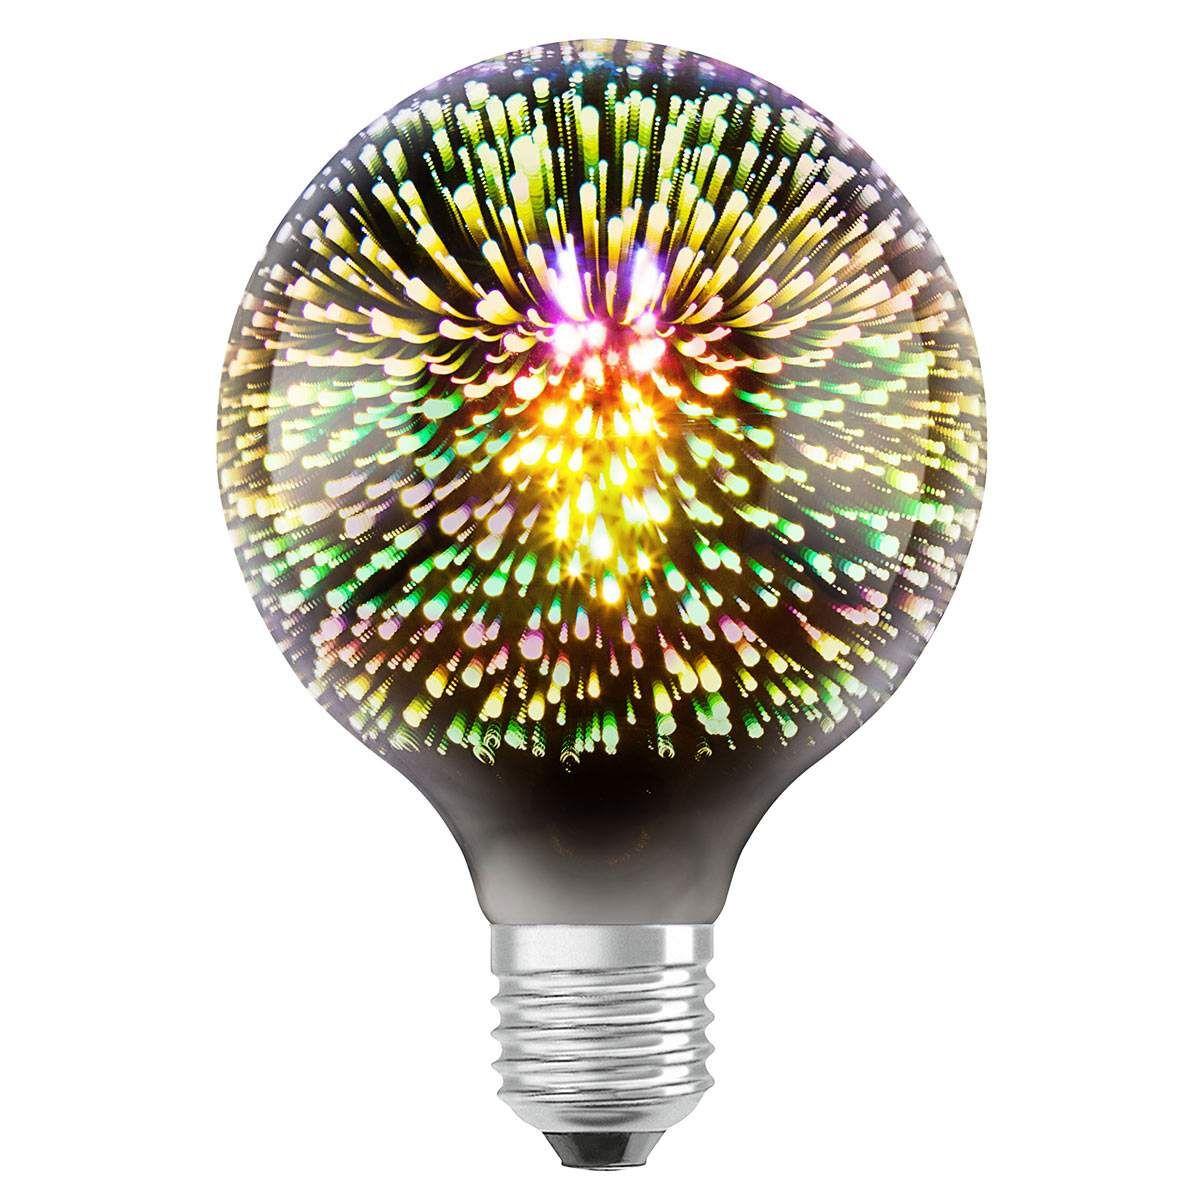 Osram Led Globelampe 3w Star Univers Funkelnd Led Led Lampe